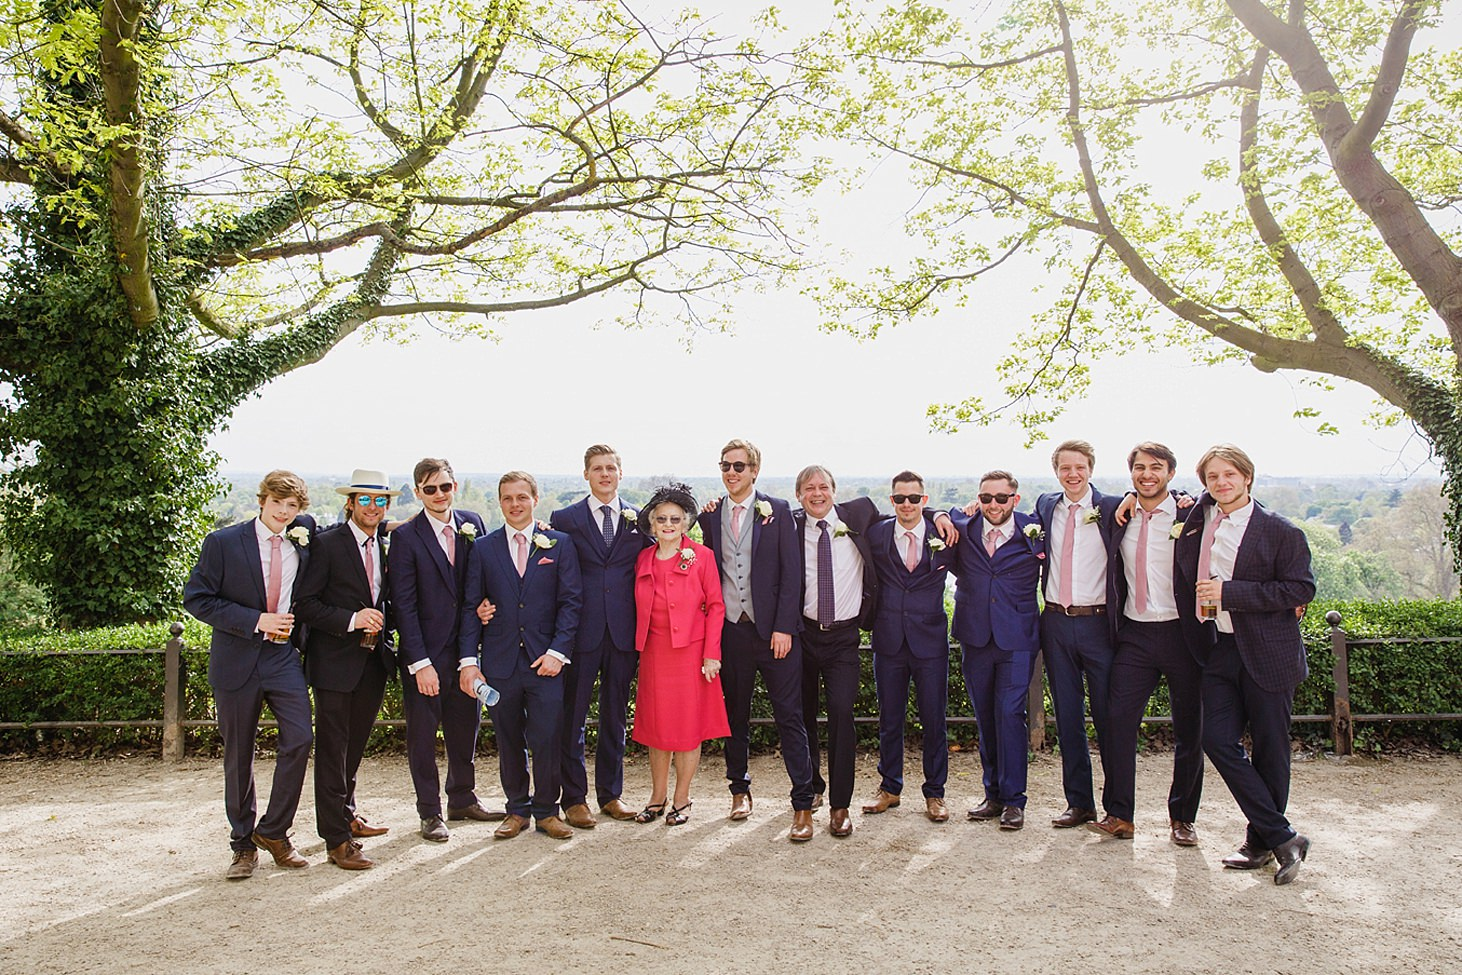 richmond hill wedding photography groomsmen